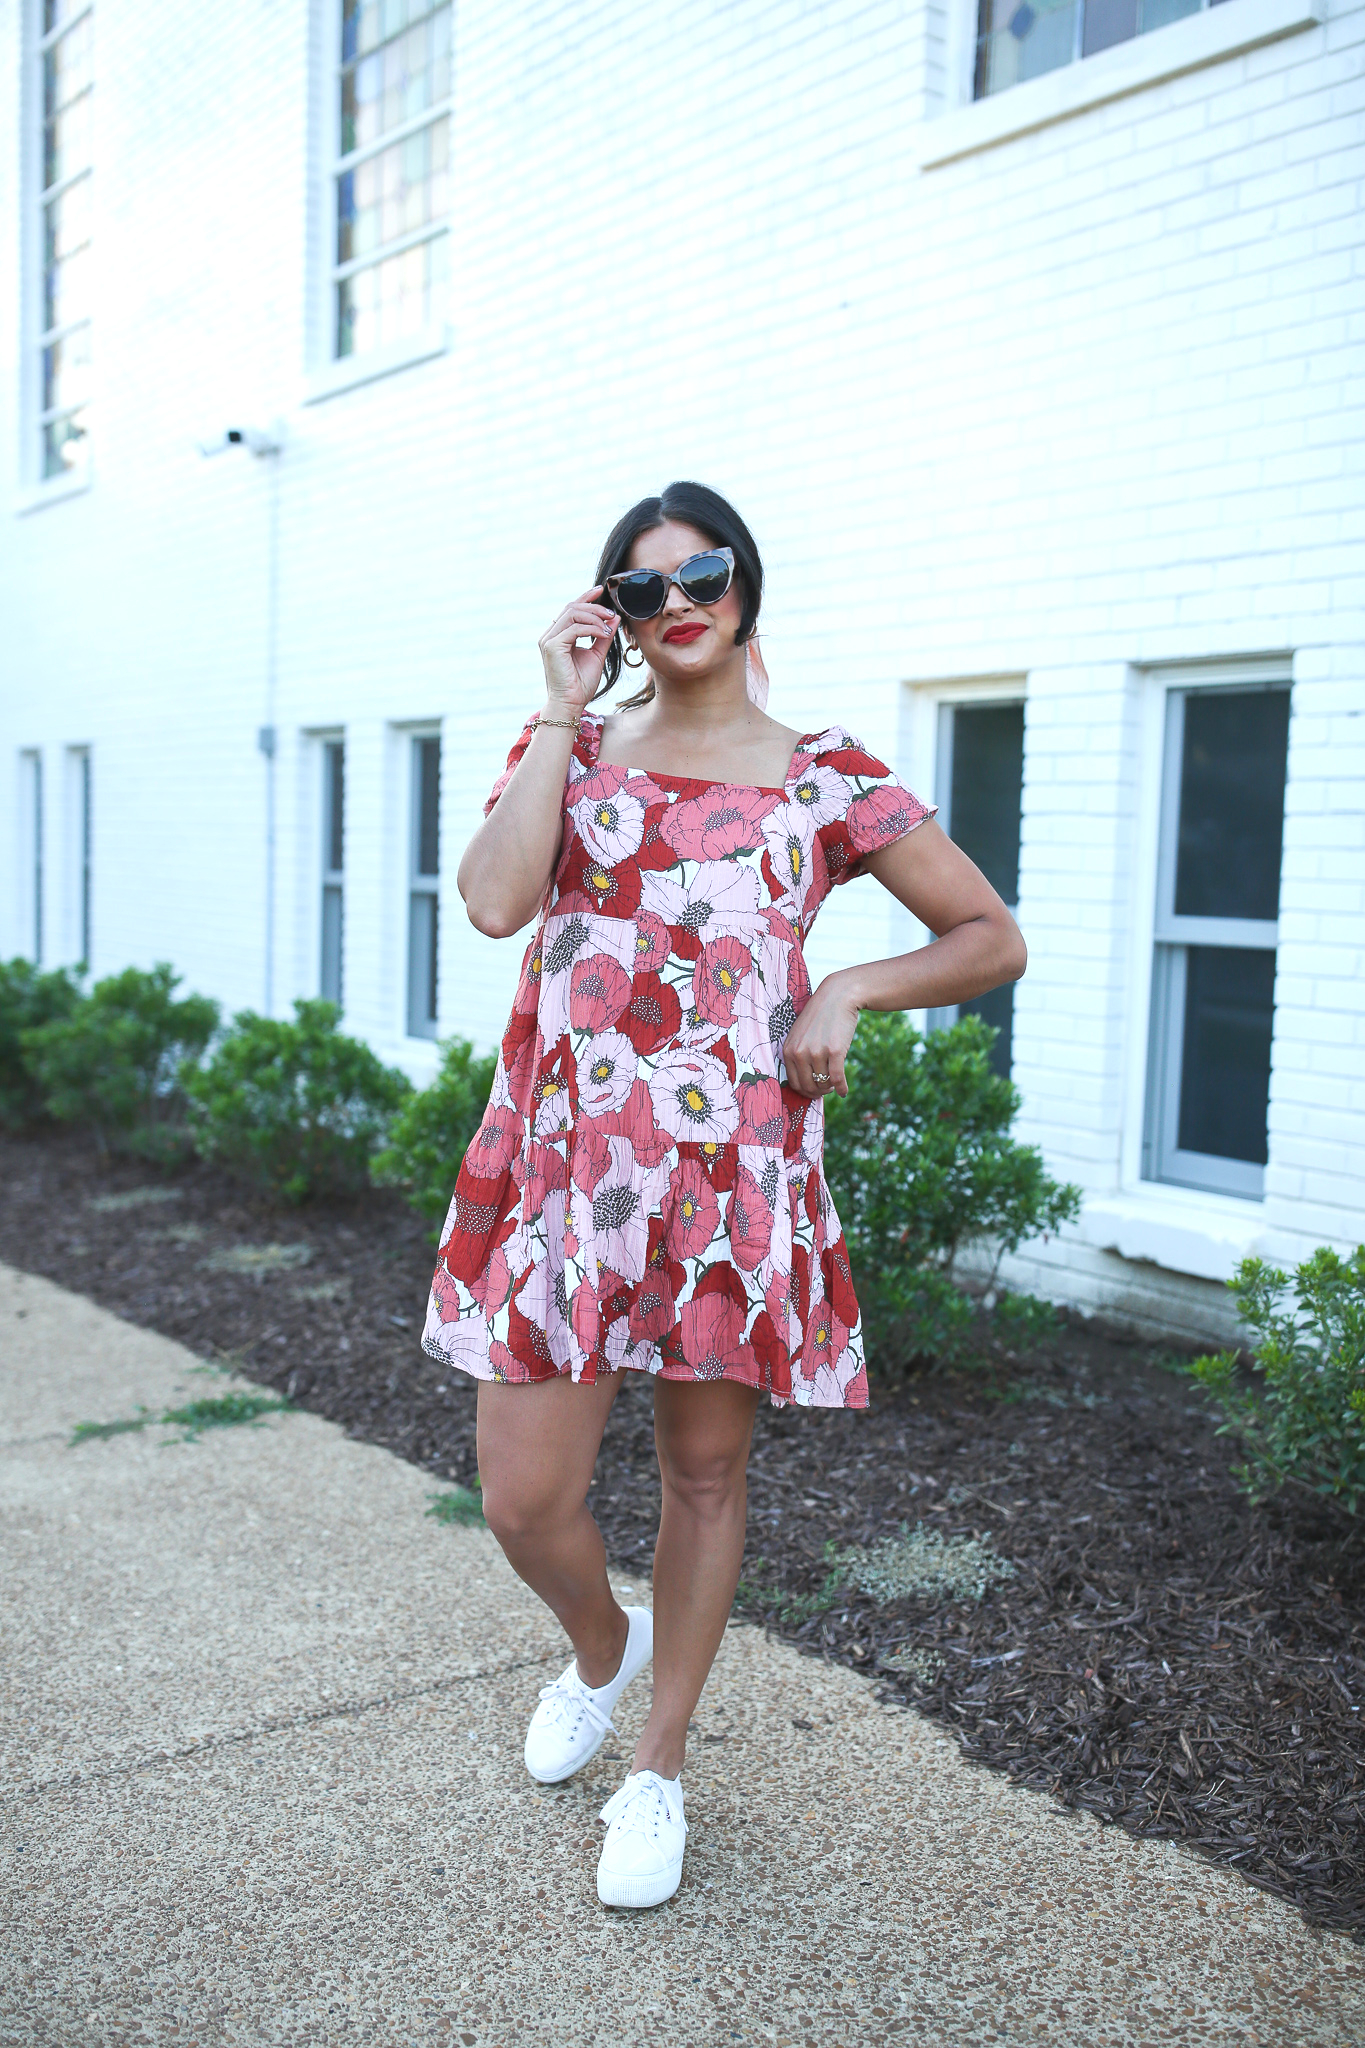 Priya the Blog, Nashville fashion blog, Nashville fashion blogger, Nashville style blog, Nashville style blogger, Summer fashion, LOFT style, loveLOFT, 70's style dress, platform Supergas, how to wear platform sneakers, Stila Beso, Stila Liquid Lipstick in Beso, 70's inspired Summer outfit